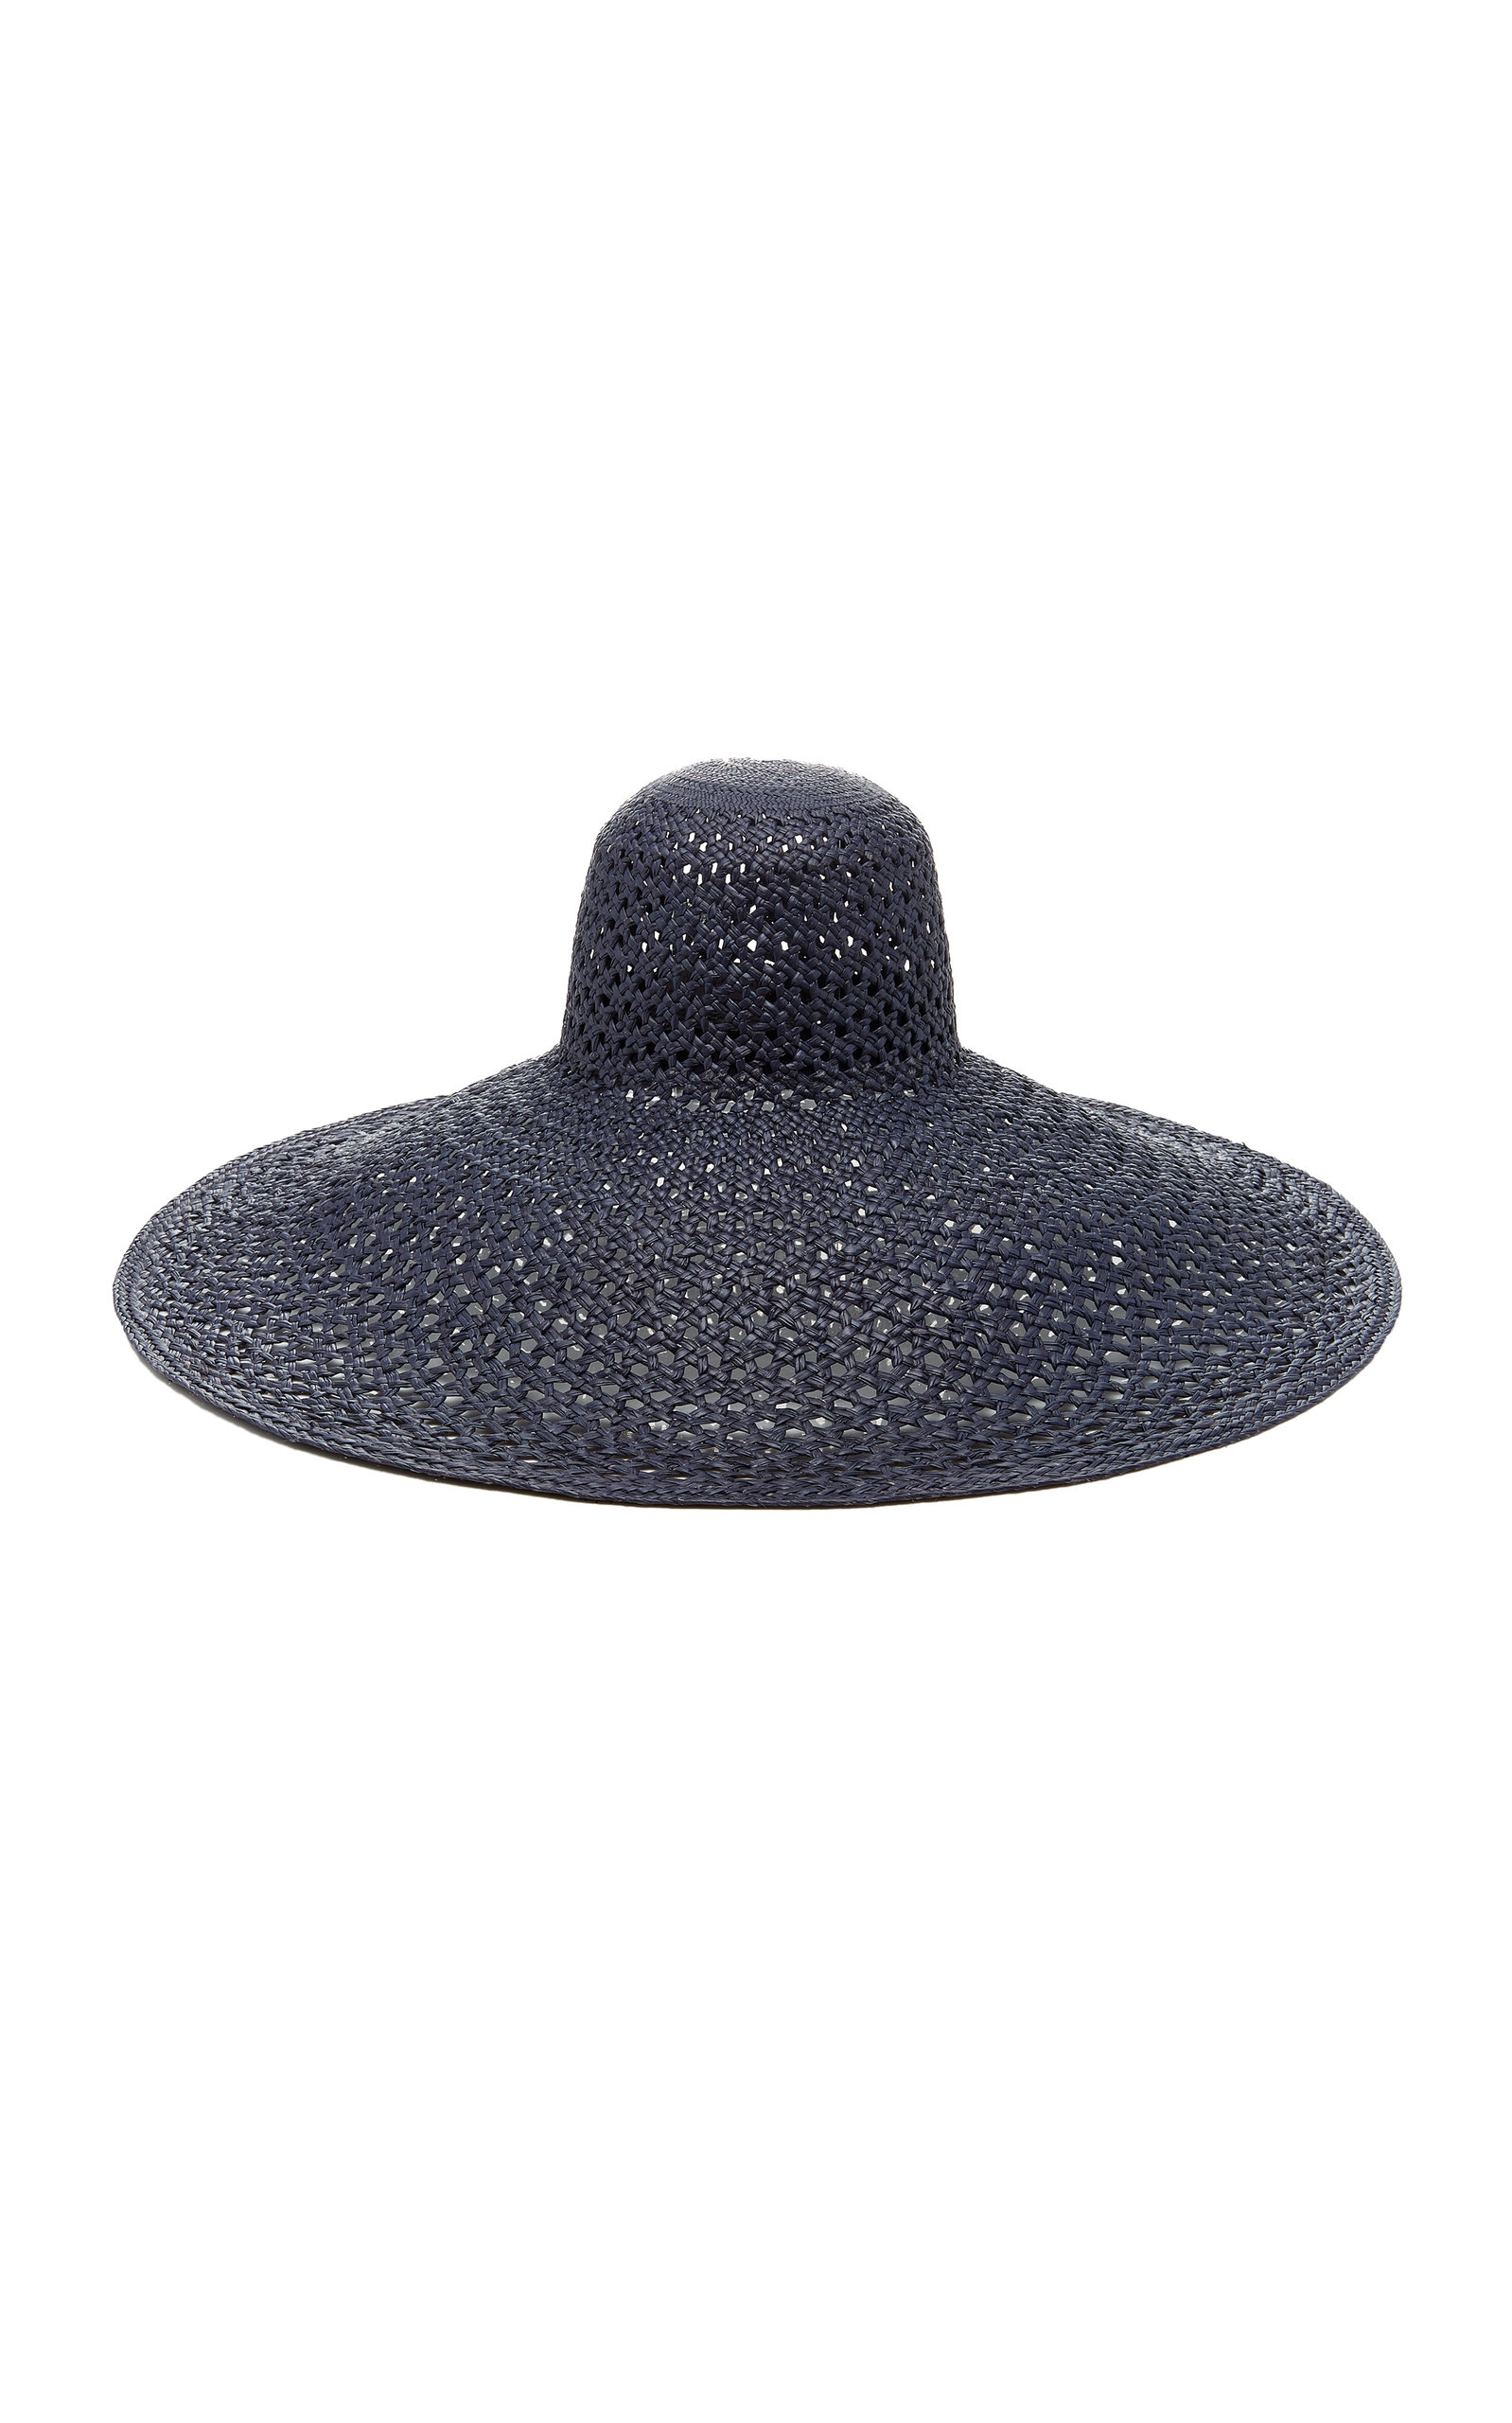 c4ba245195a Lola Hats Pergola Seagrass Straw Hat